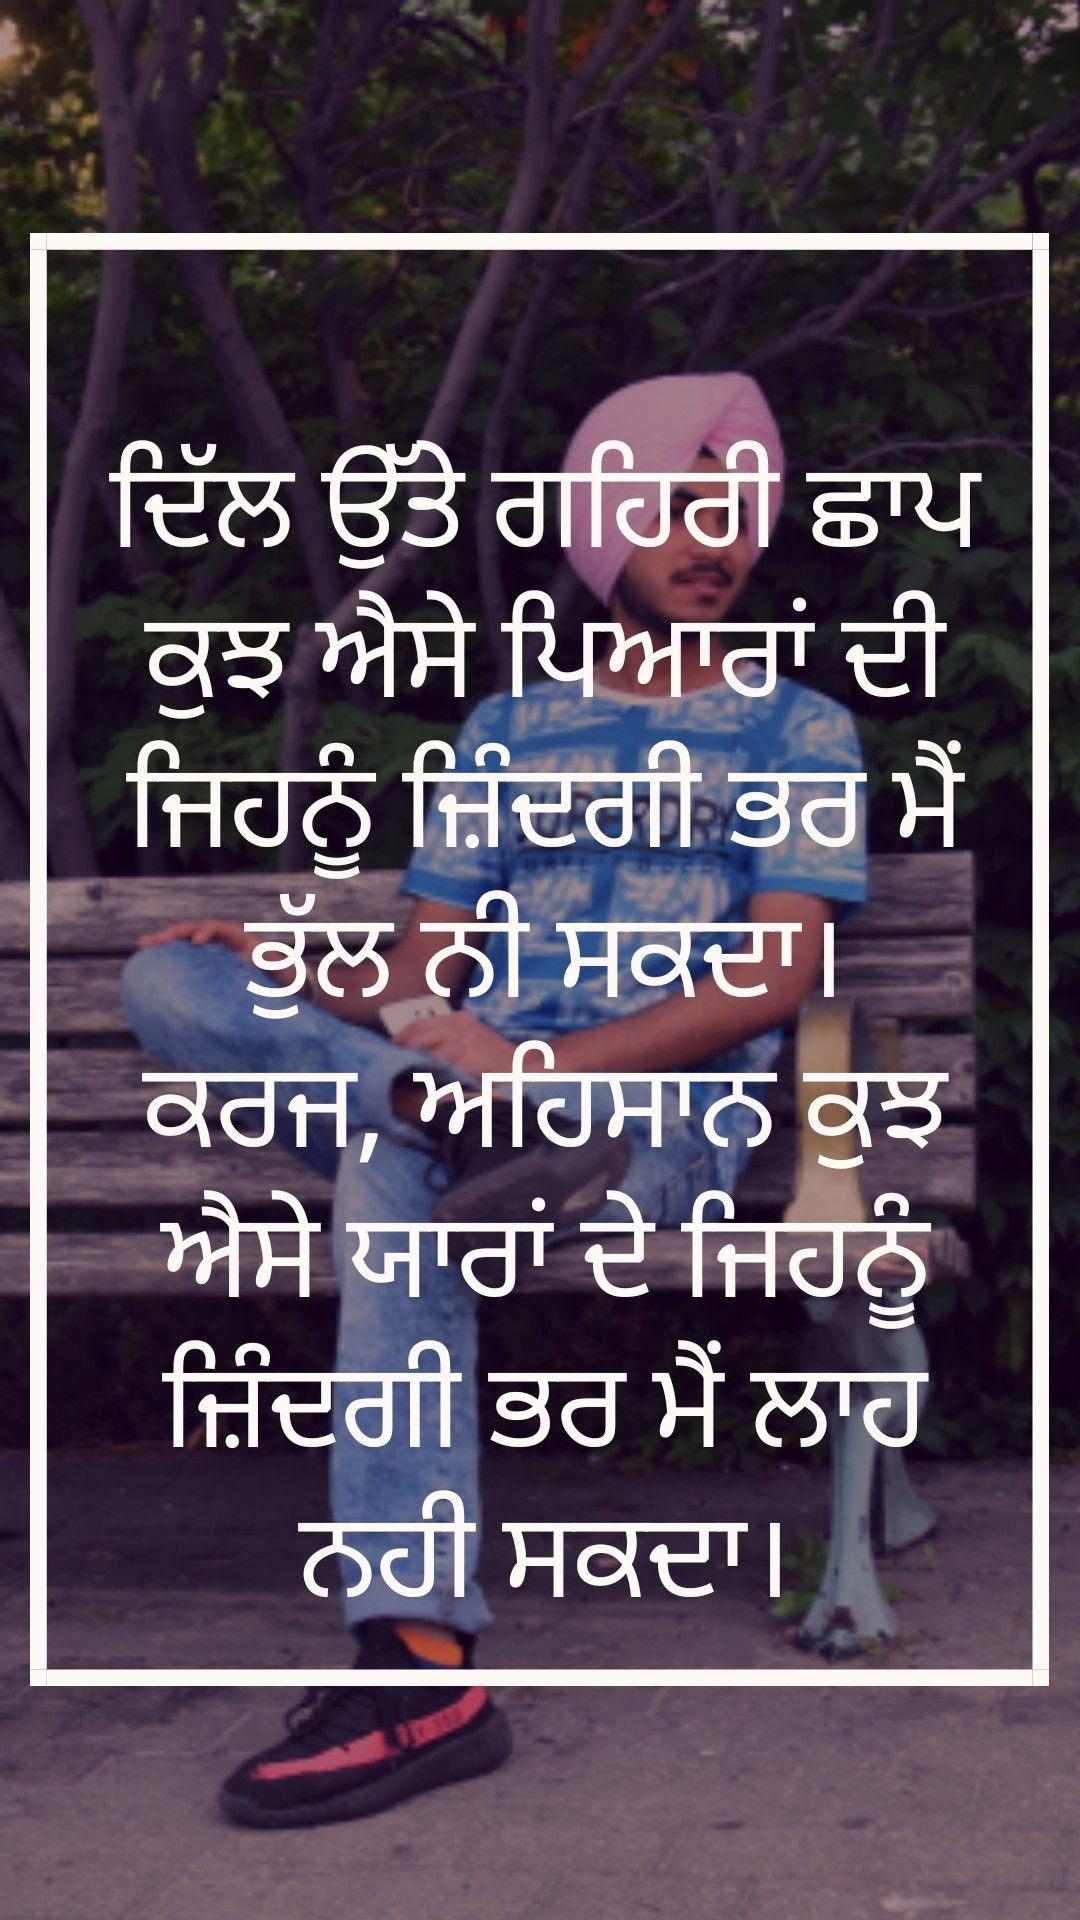 Friendship day #best #friends #punjabi #yaar #beli #quotes